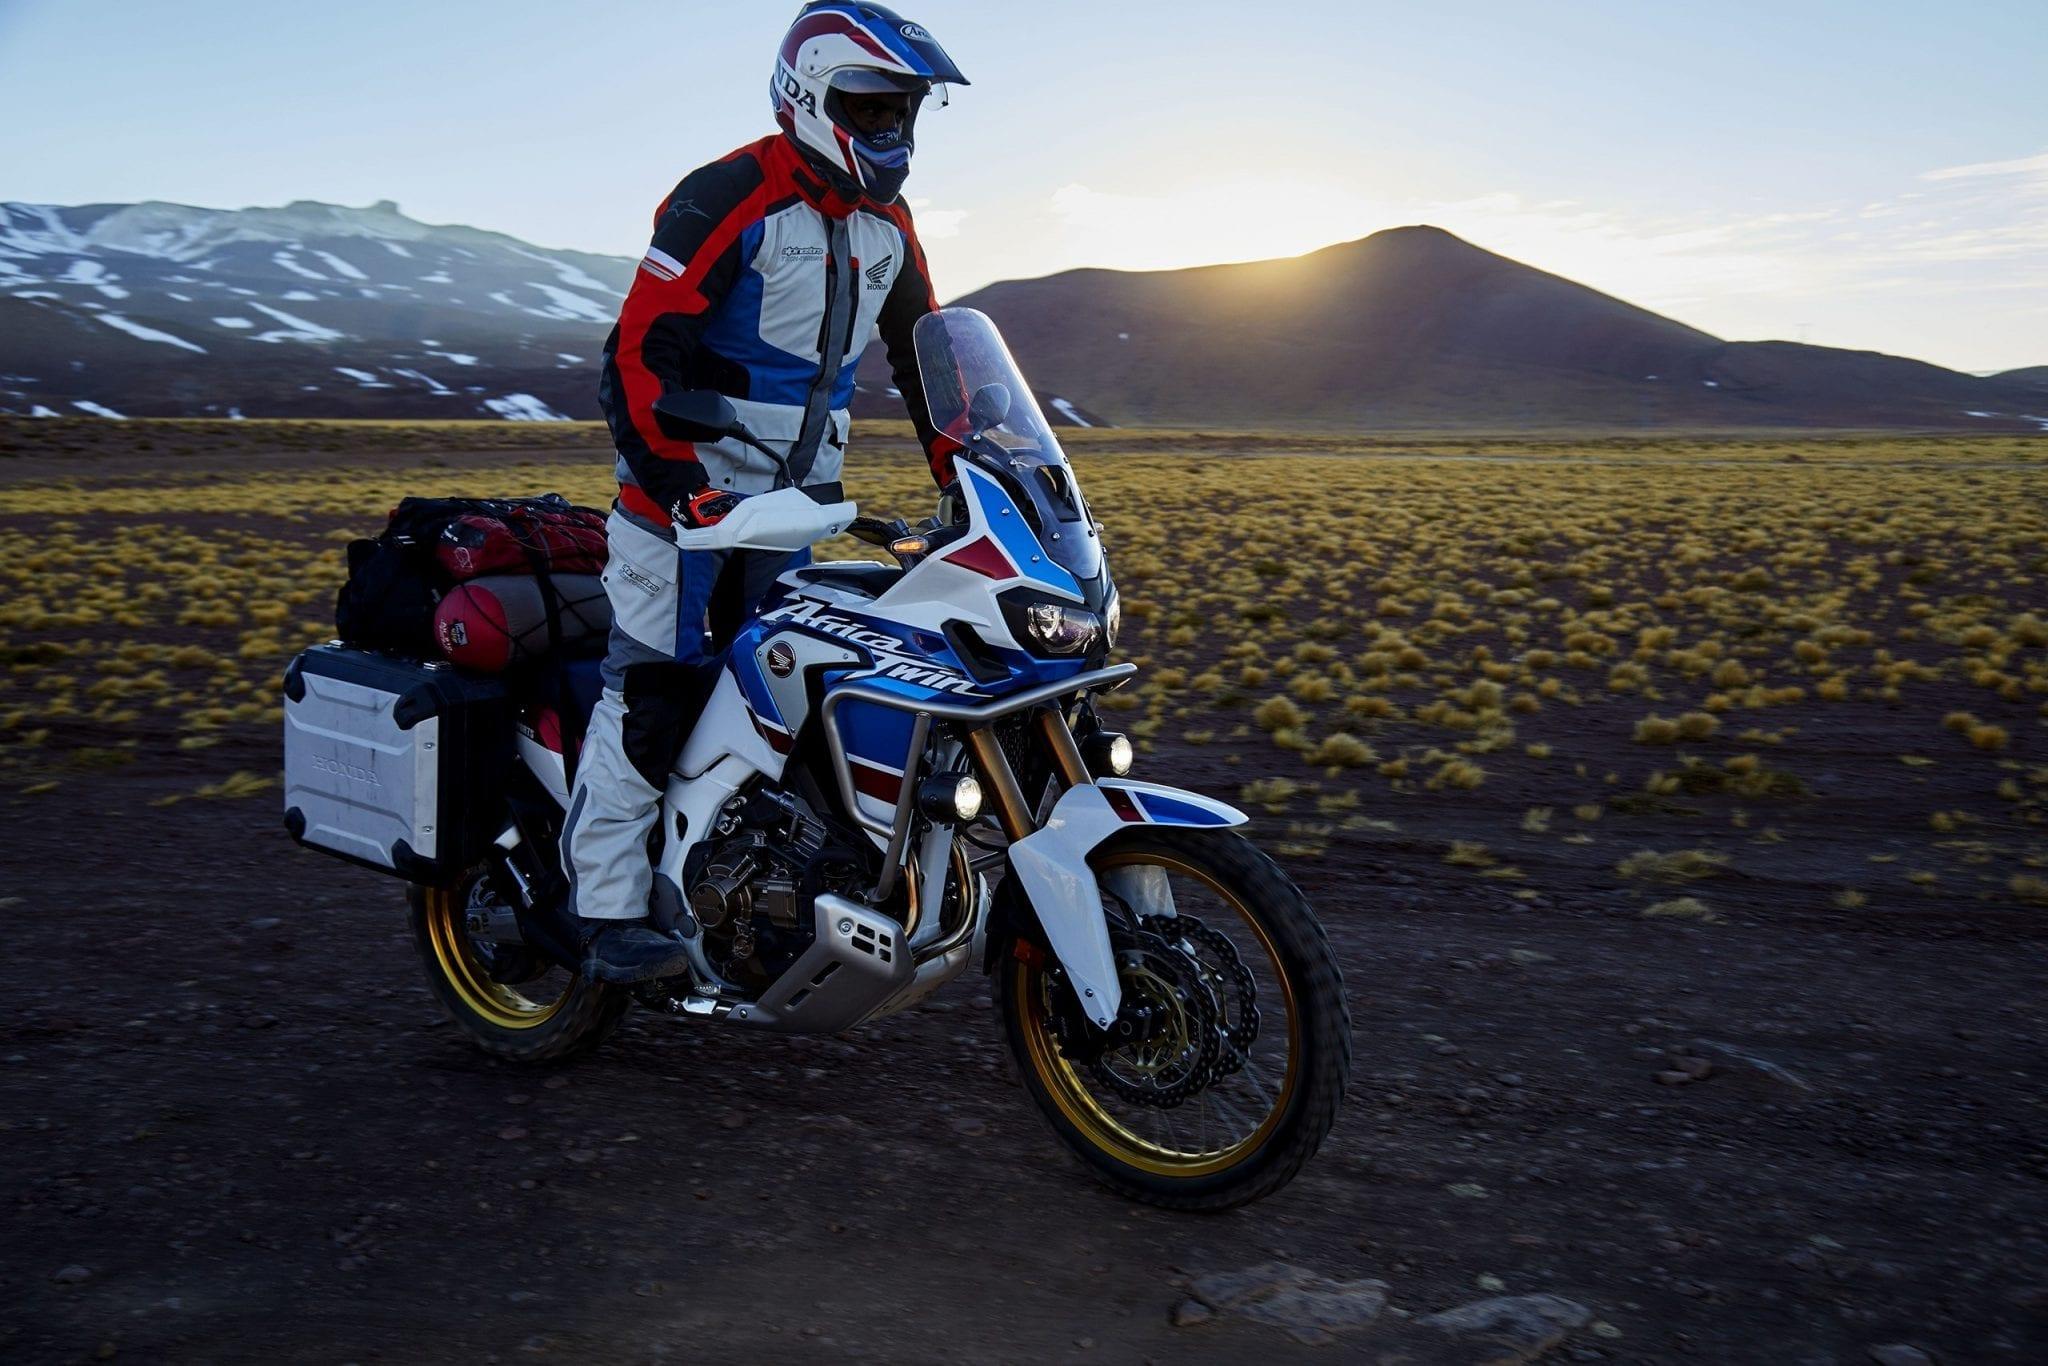 Honda Africa Twin Adventure Sports sur une piste caillouteuse pendant un raid moto Askja en Islande, juillet 2021